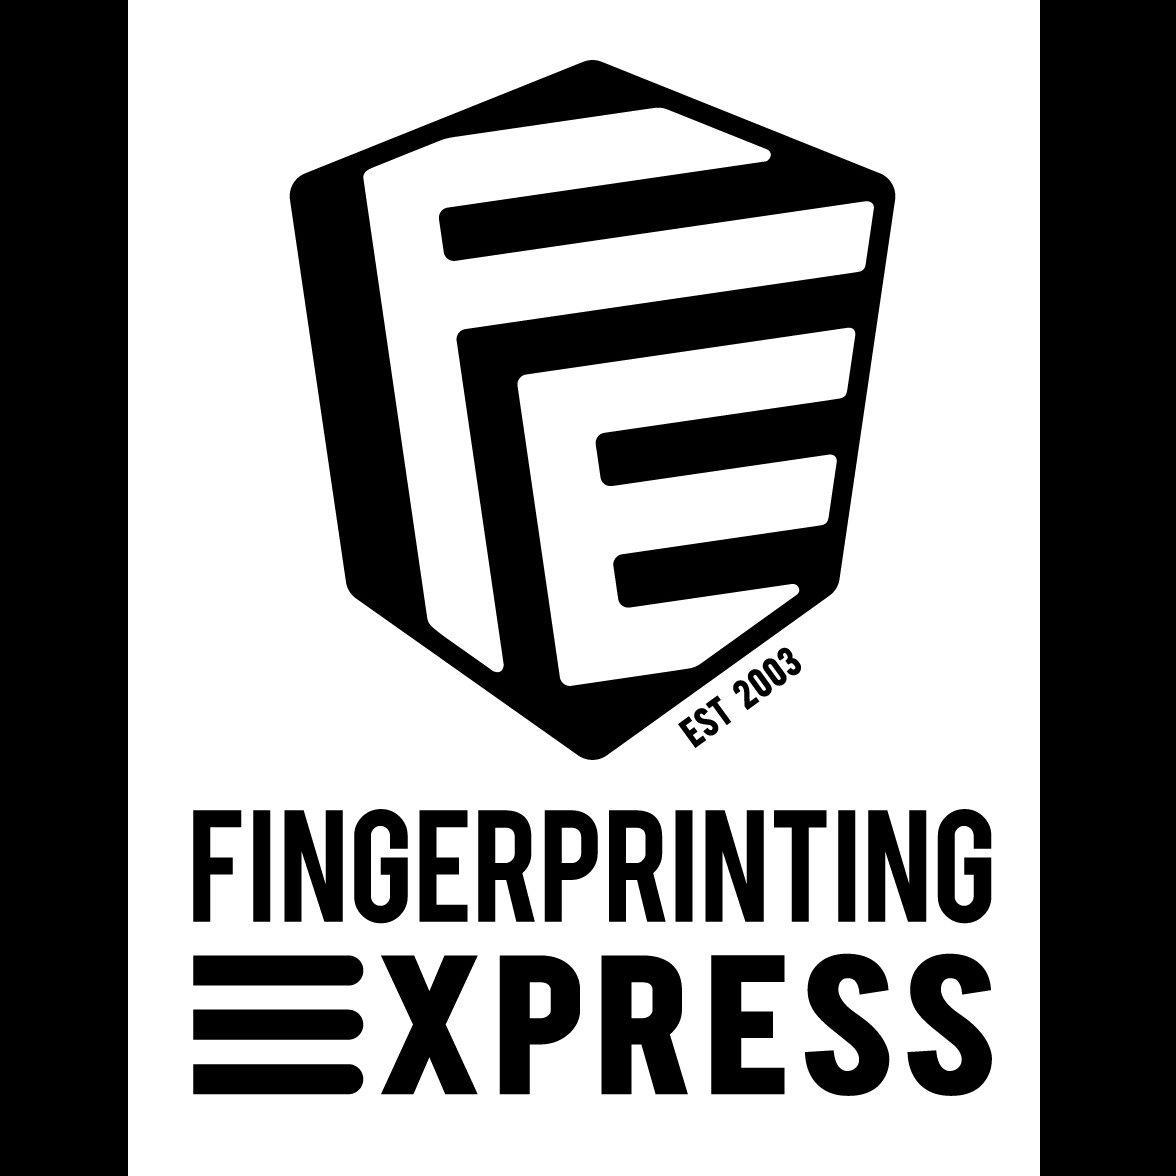 Fingerprinting Express Las Vegas